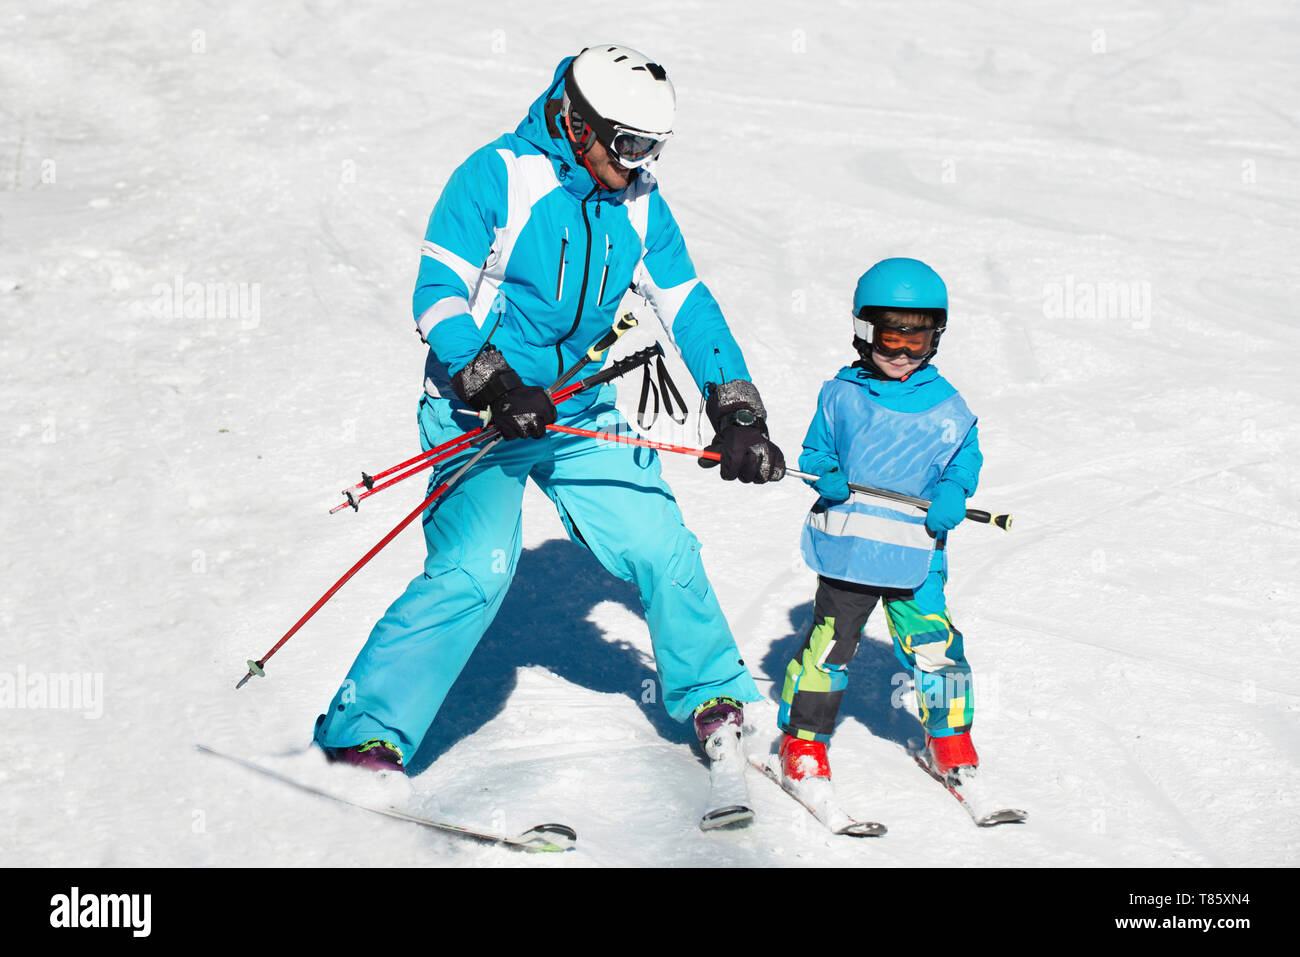 Ski school - Stock Image